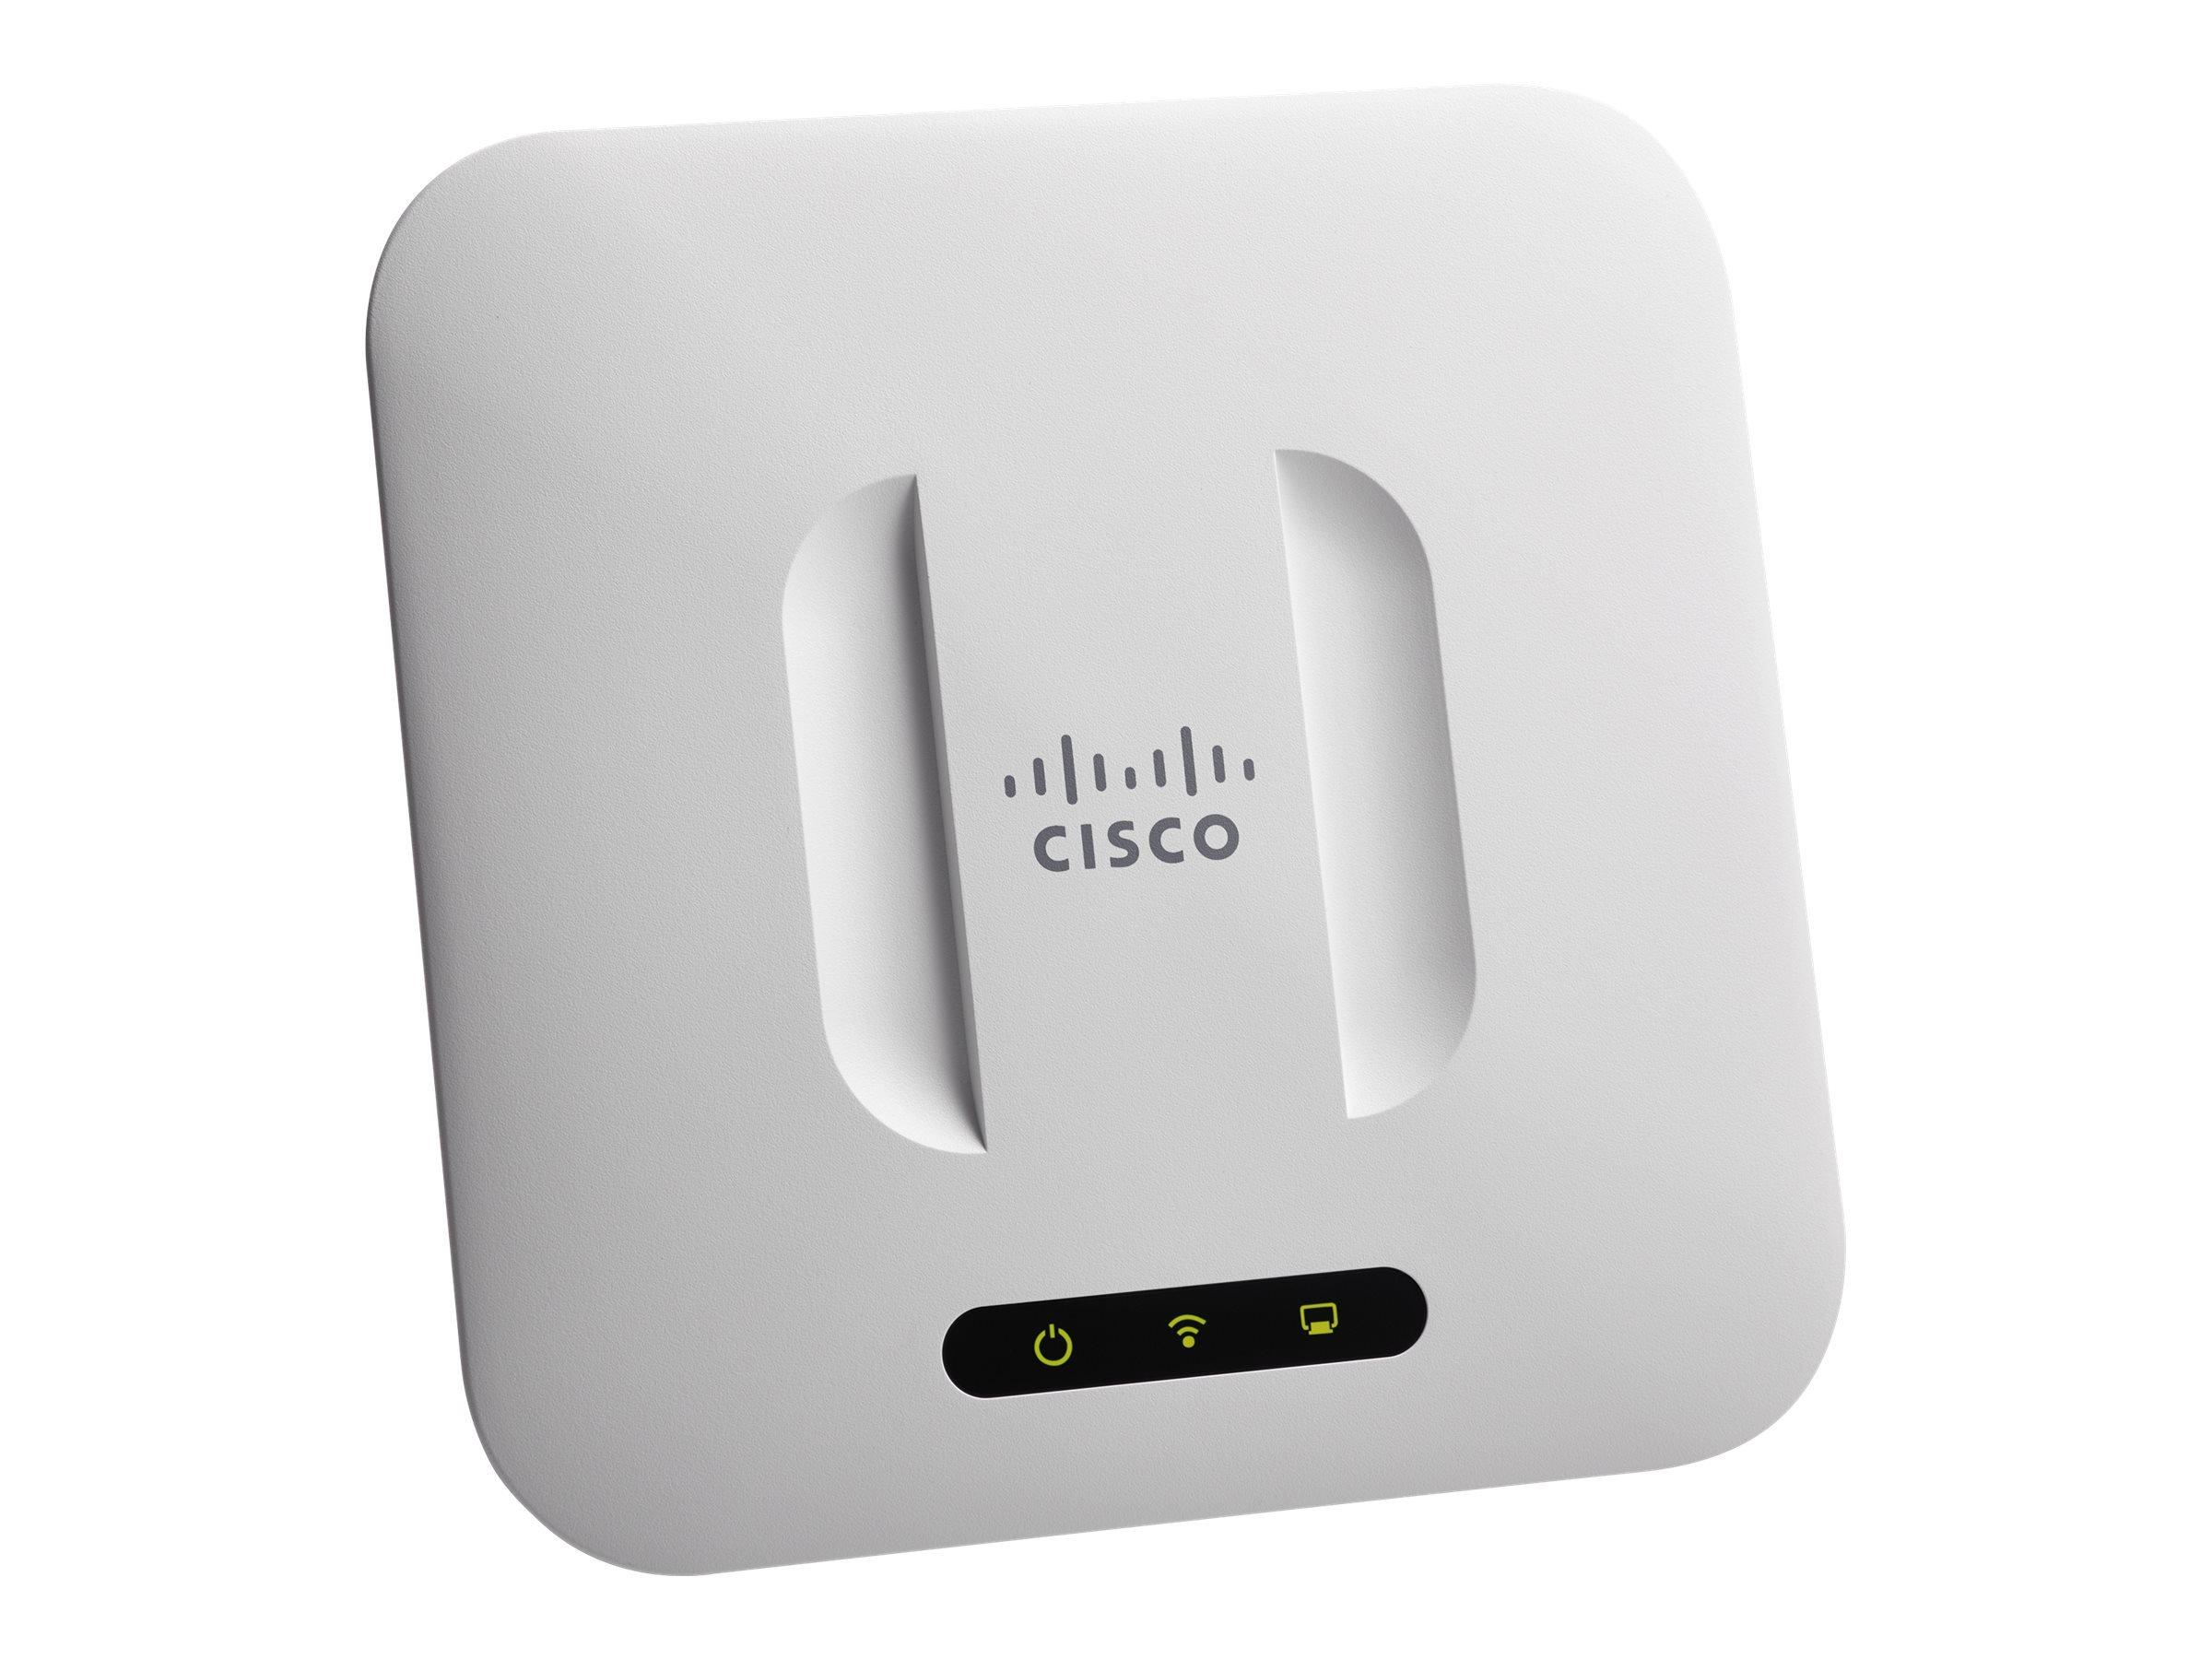 CISCO SYSTEMS 802.11ac Wireless Access Point (WAP371AK9) by Cisco Systems